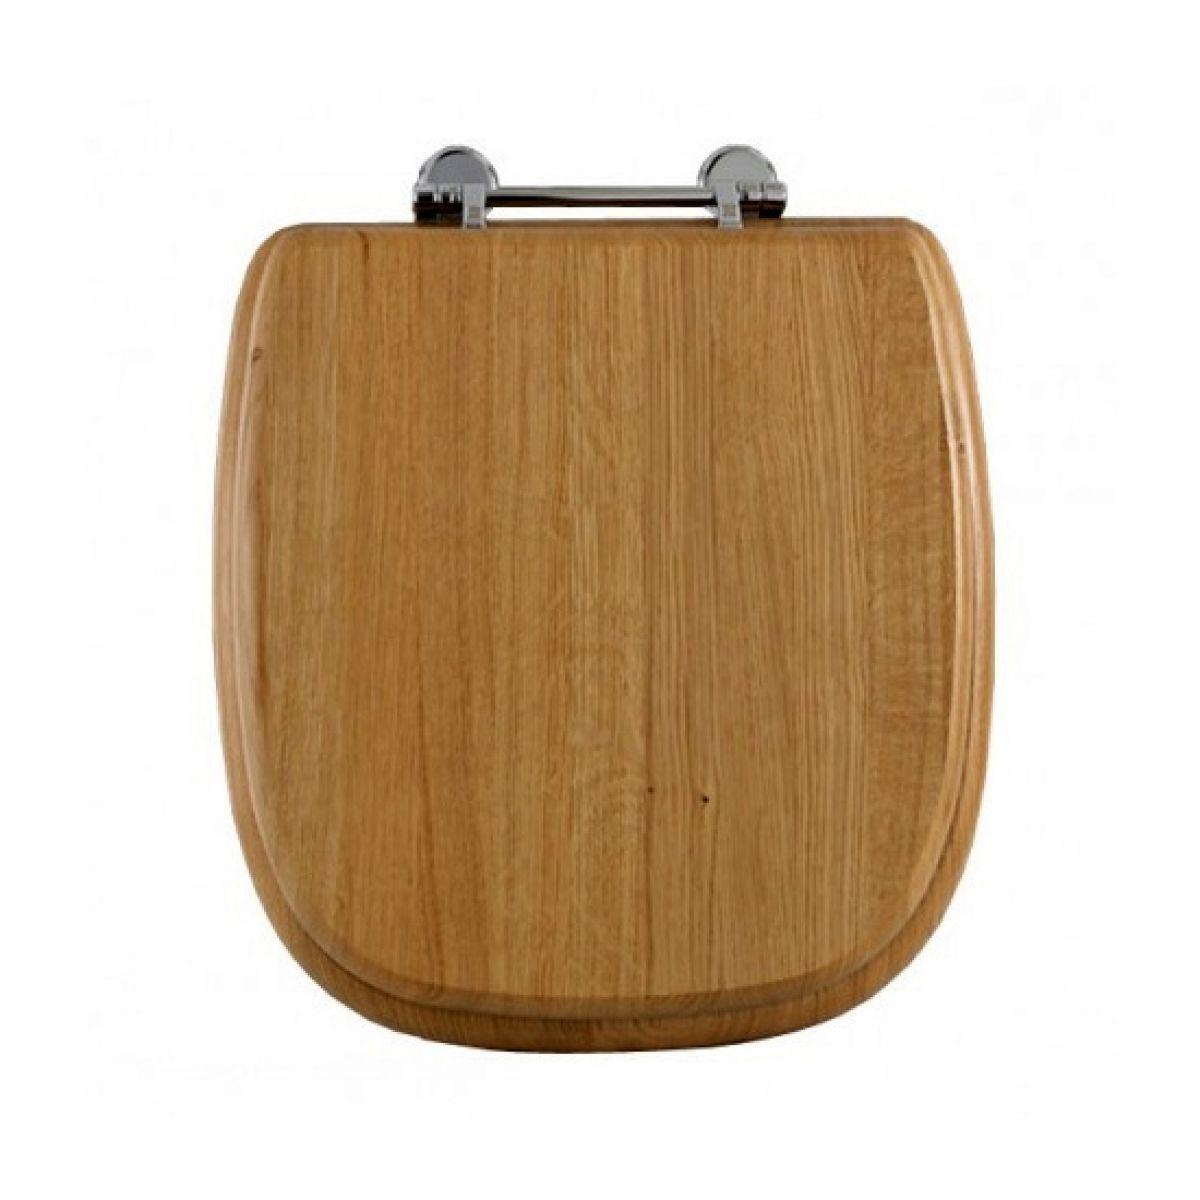 imperial radcliffe solid wood toilet seat uk bathrooms. Black Bedroom Furniture Sets. Home Design Ideas